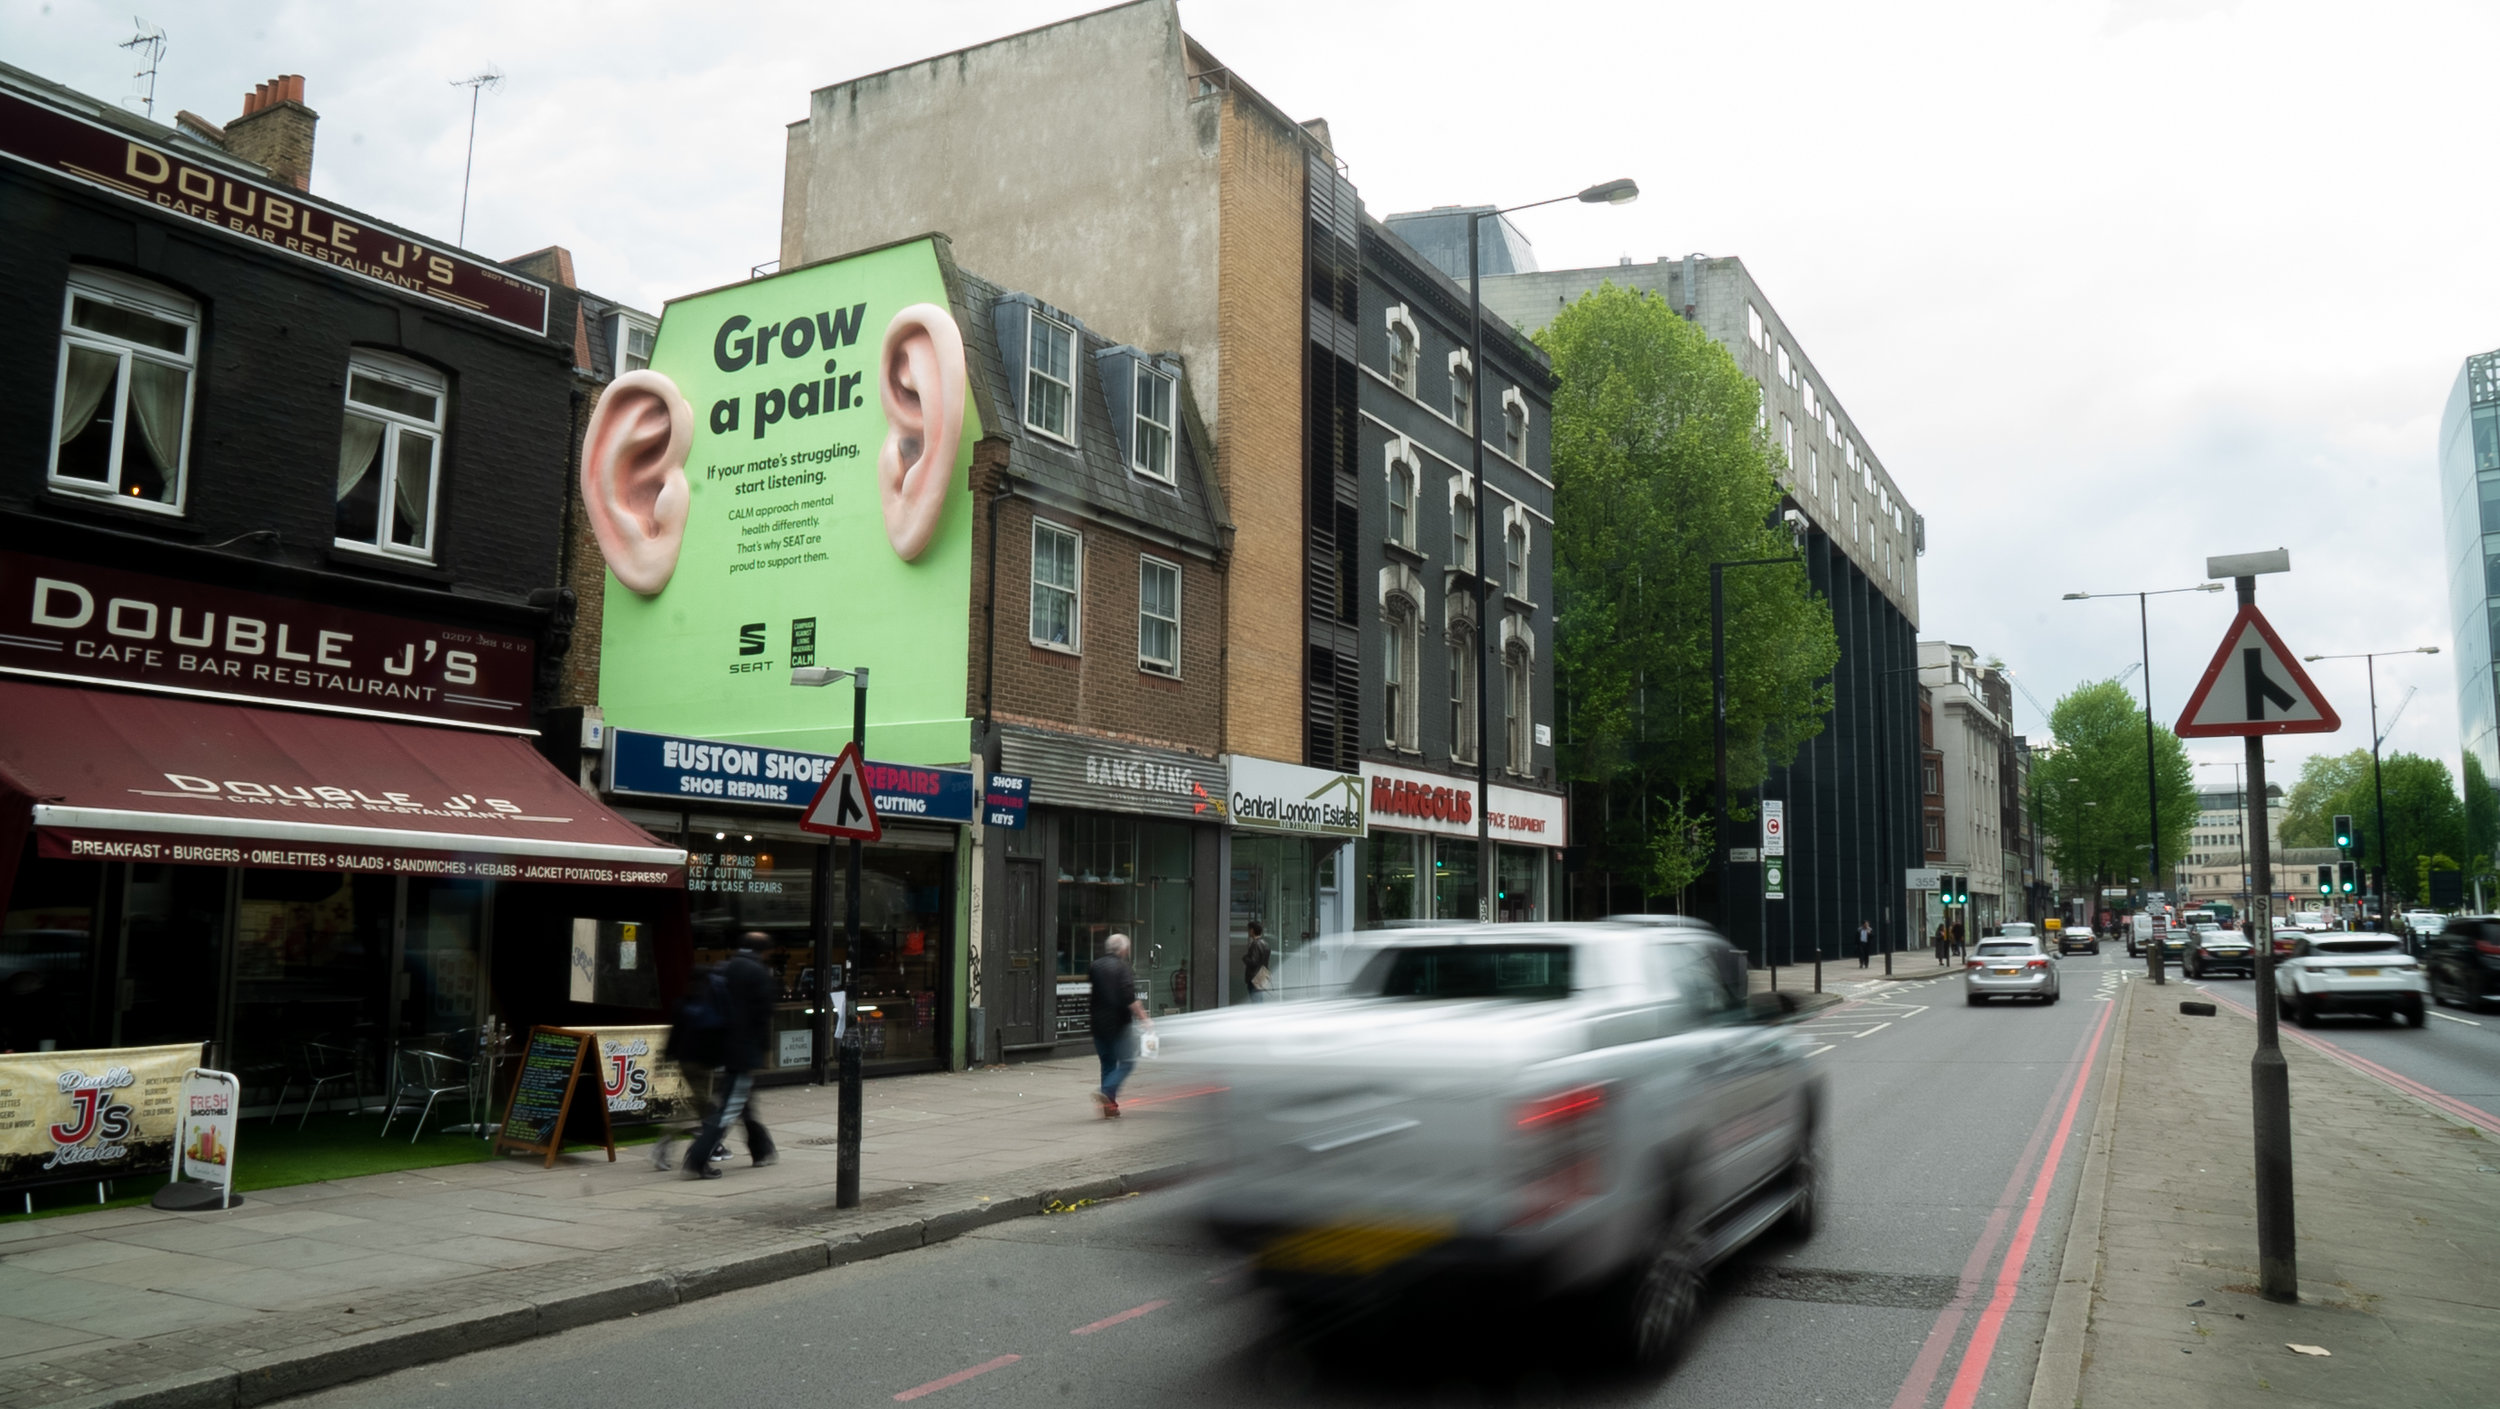 SEAT x Calm, Euston Road  (8 of 10).jpg